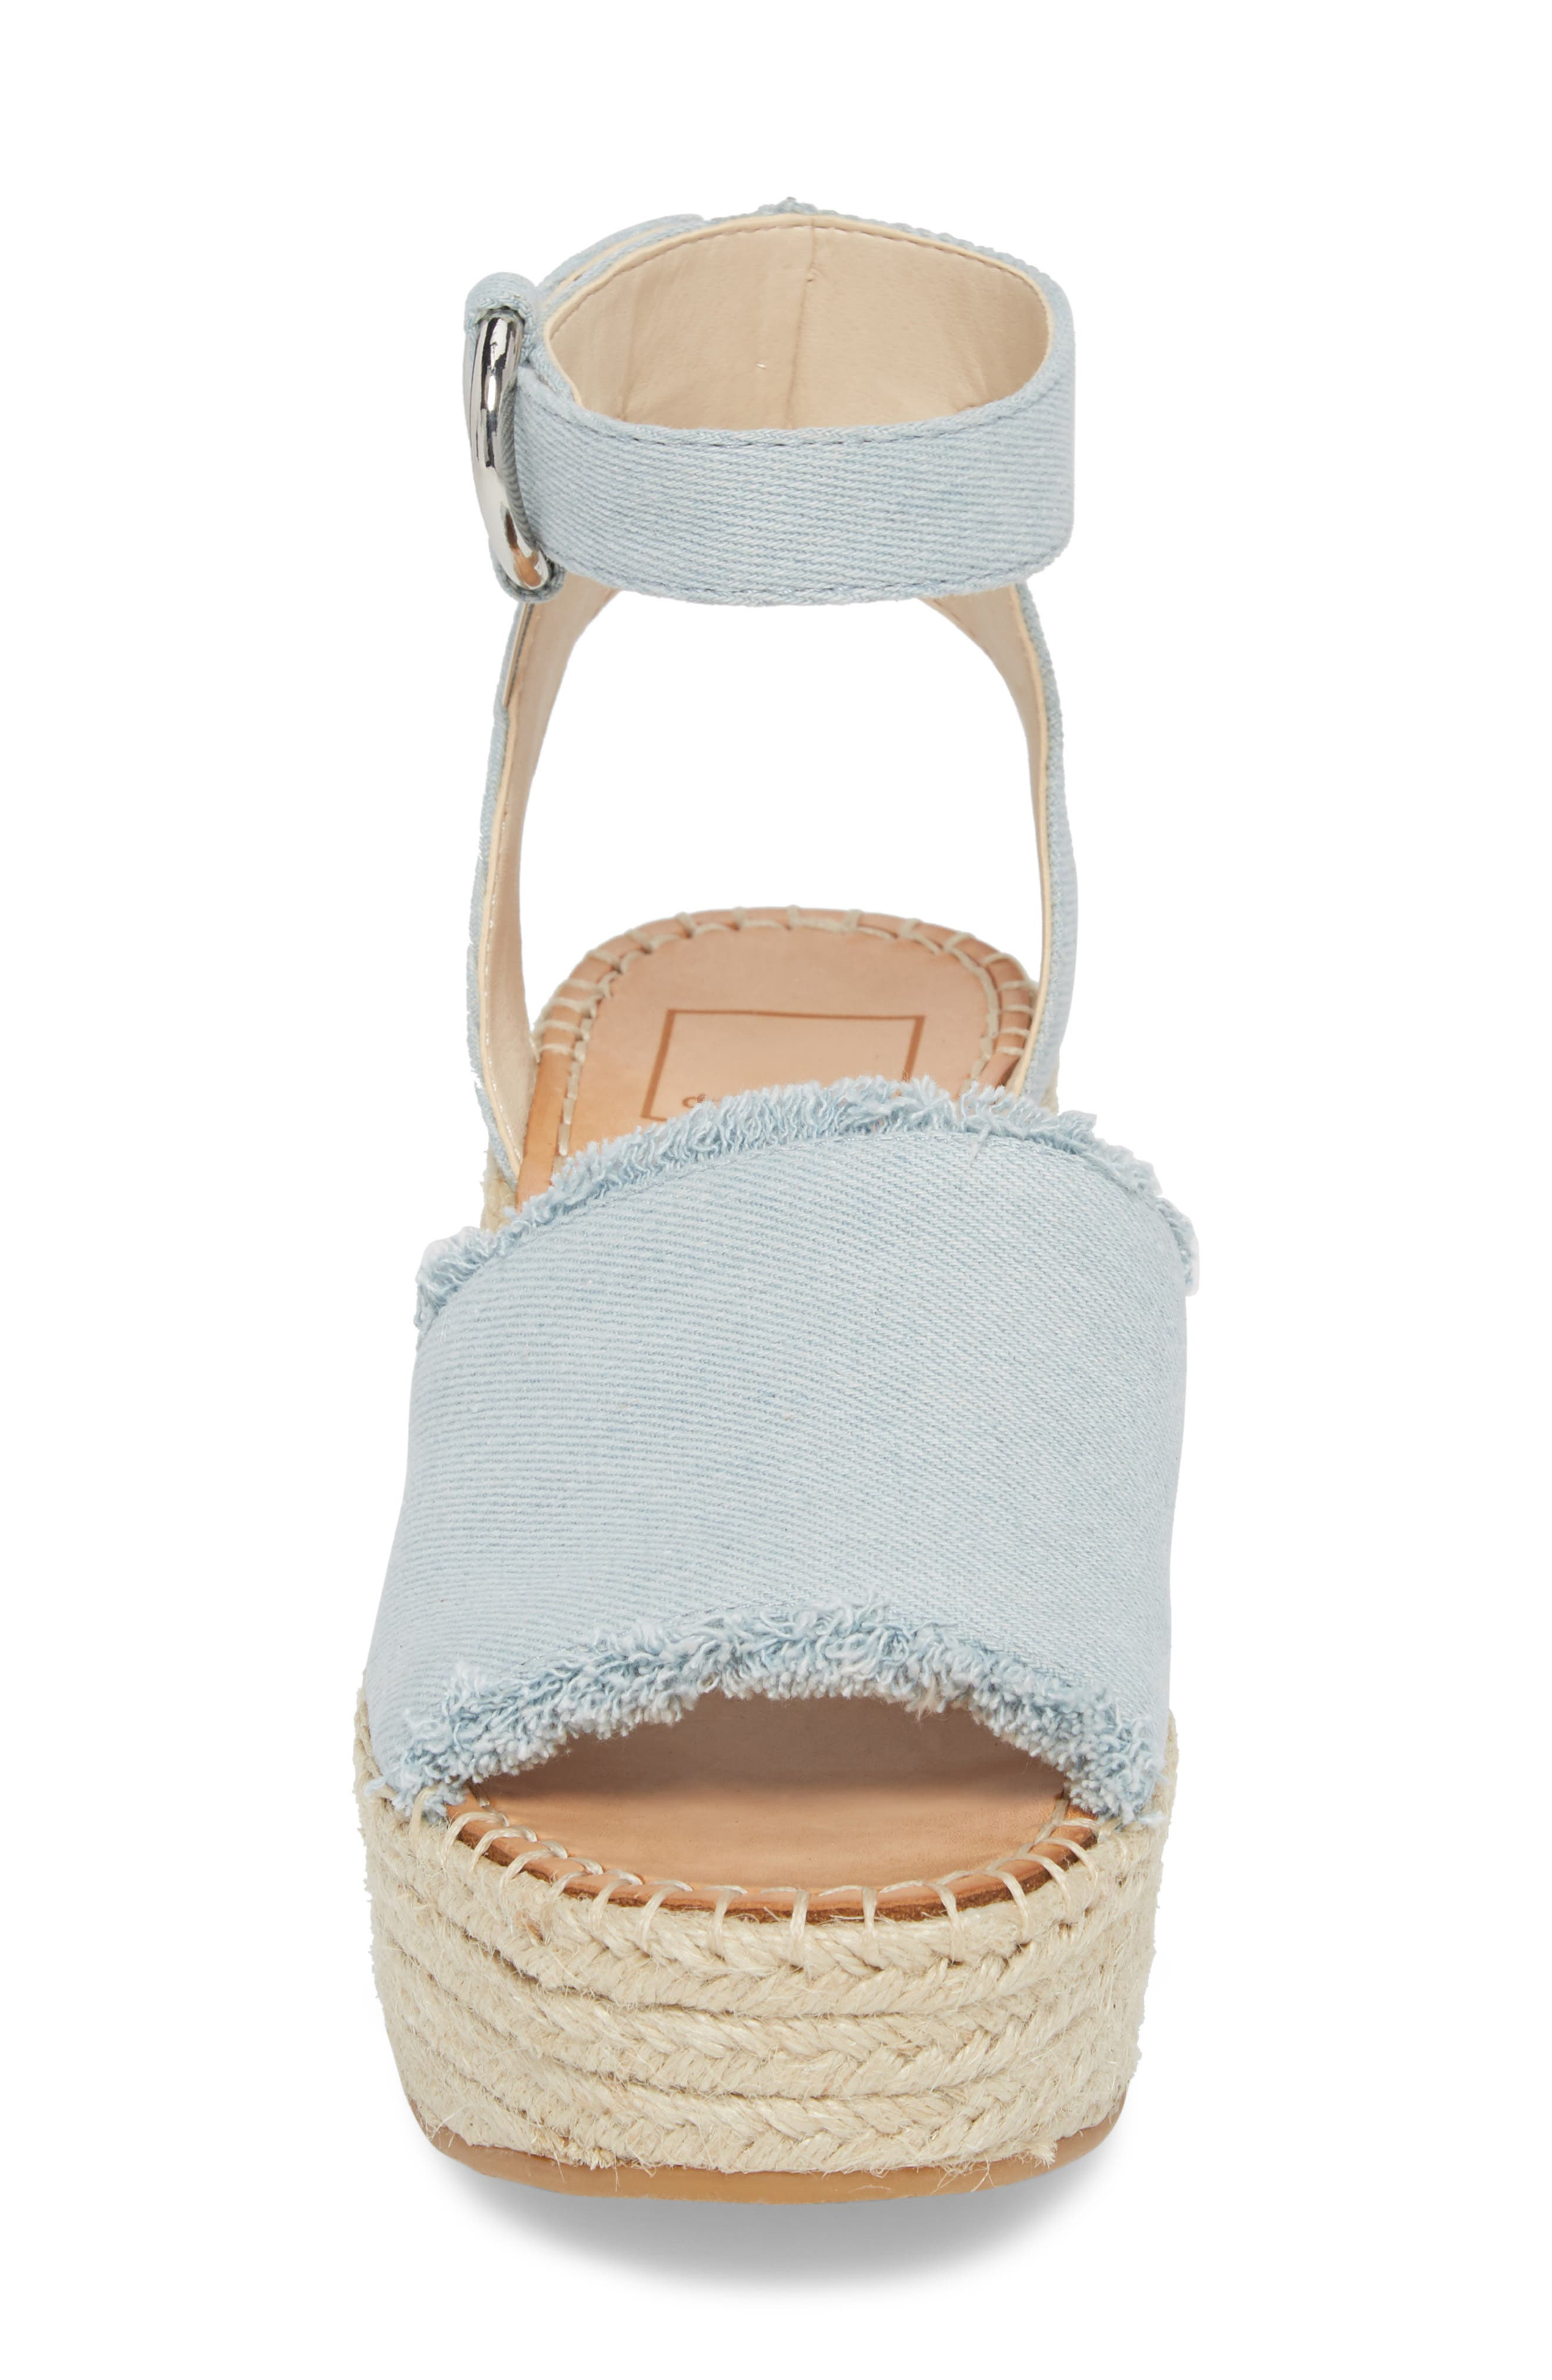 Lesly Espadrille Platform Sandal,                             Alternate thumbnail 25, color,